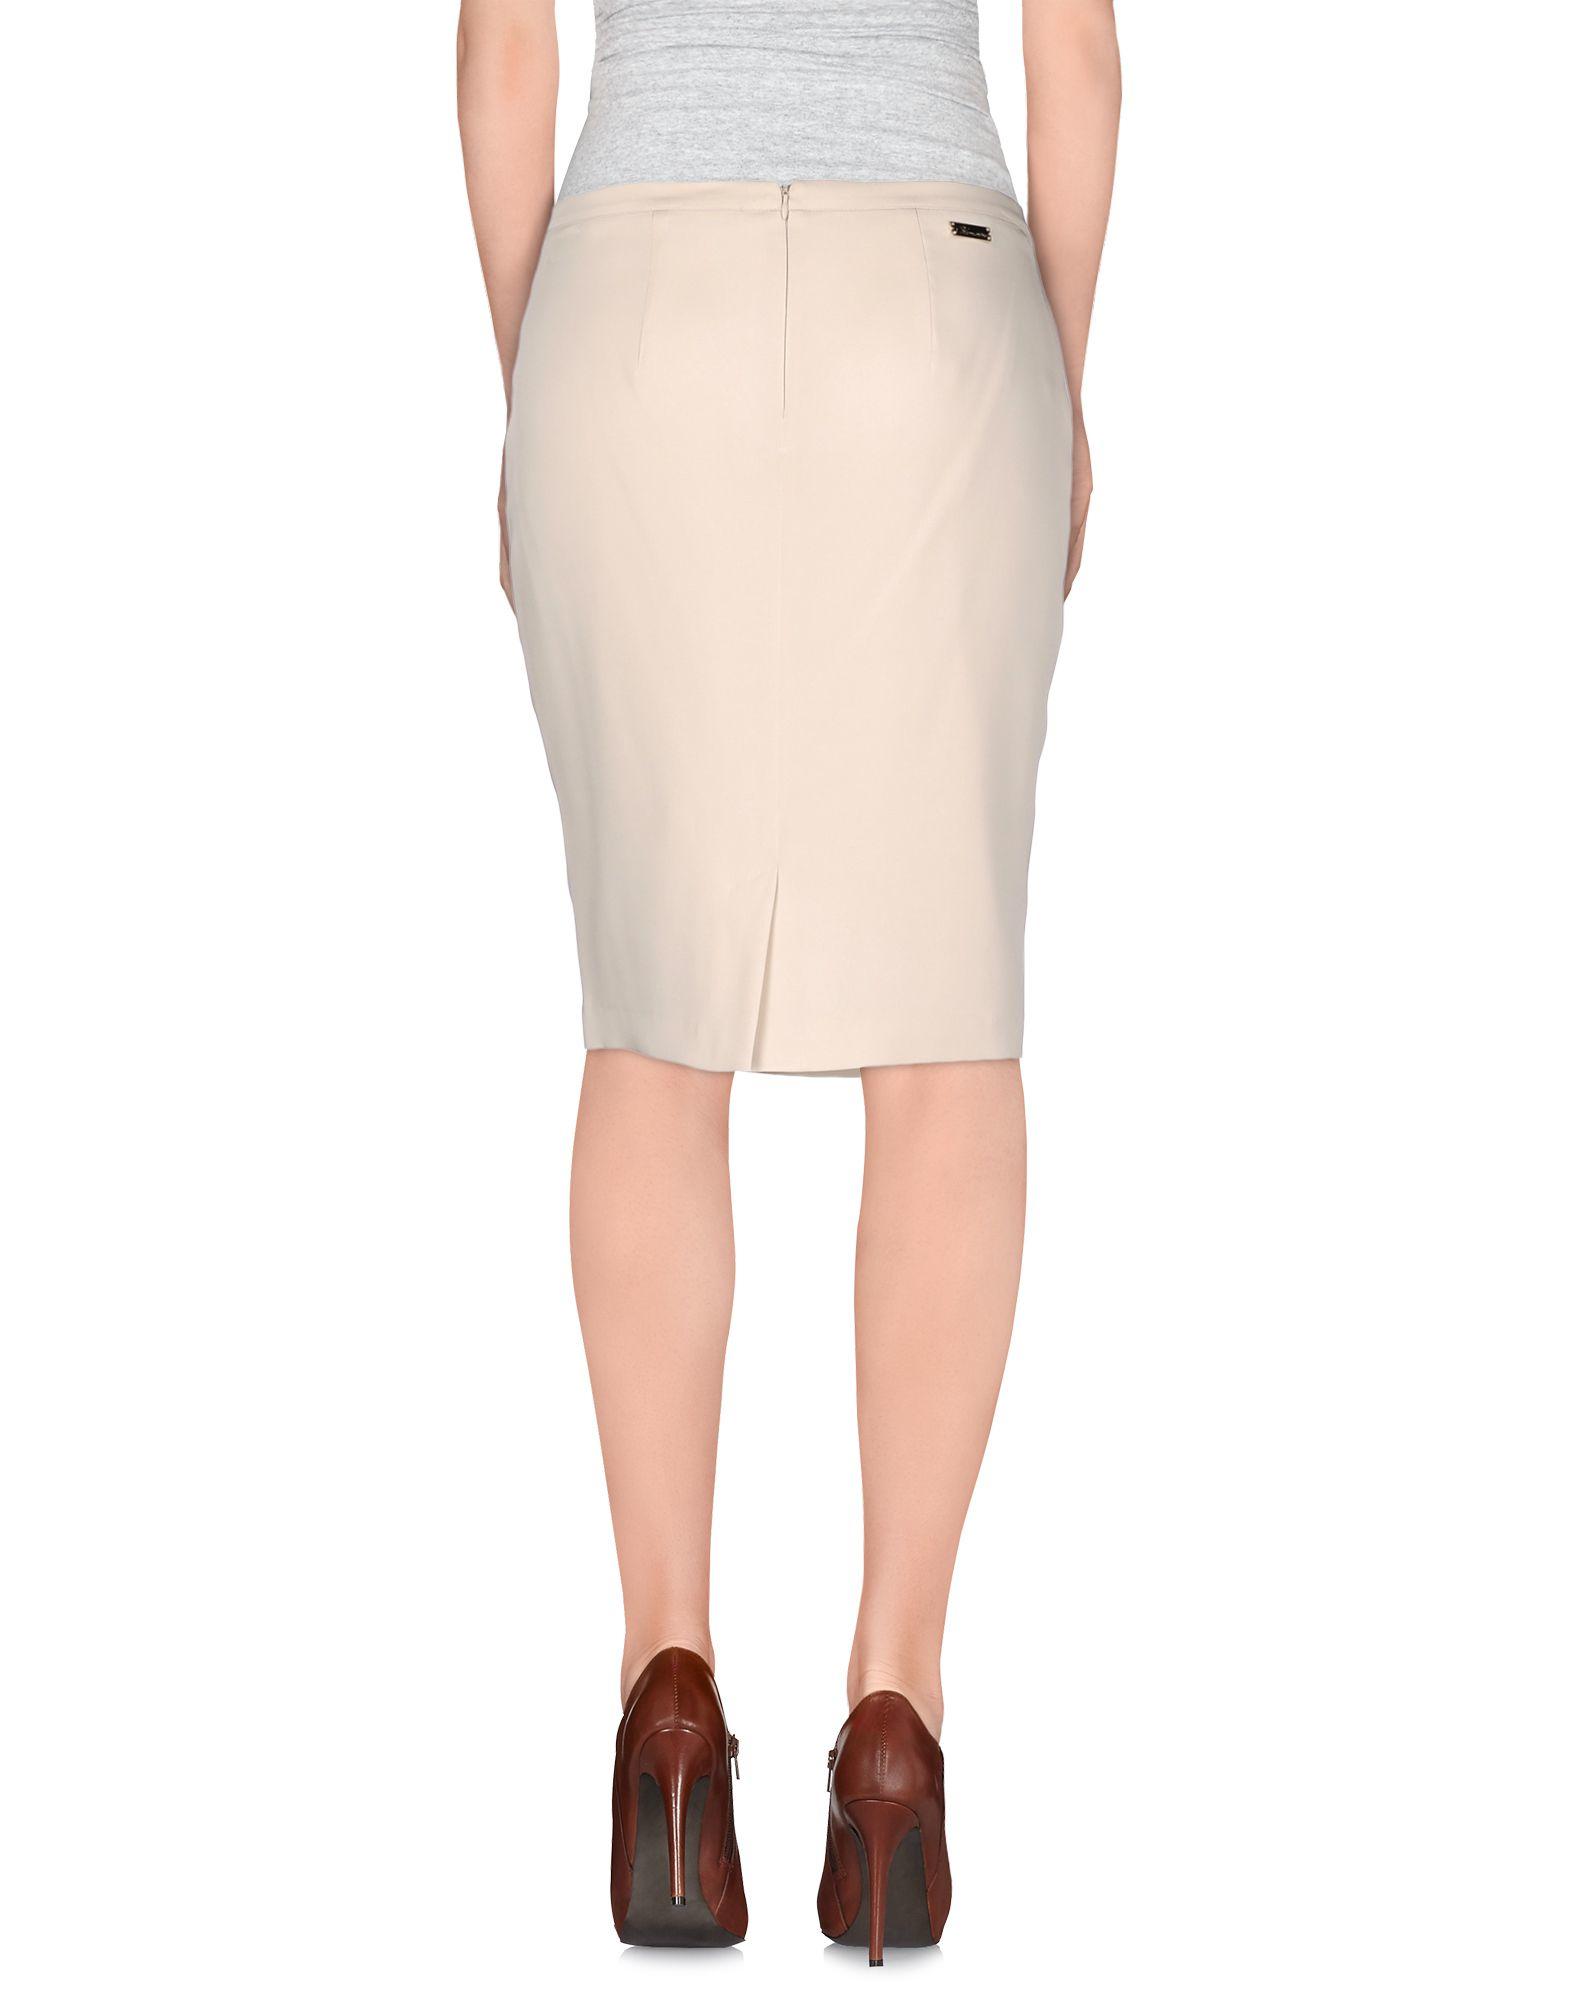 blumarine knee length skirt in beige lyst